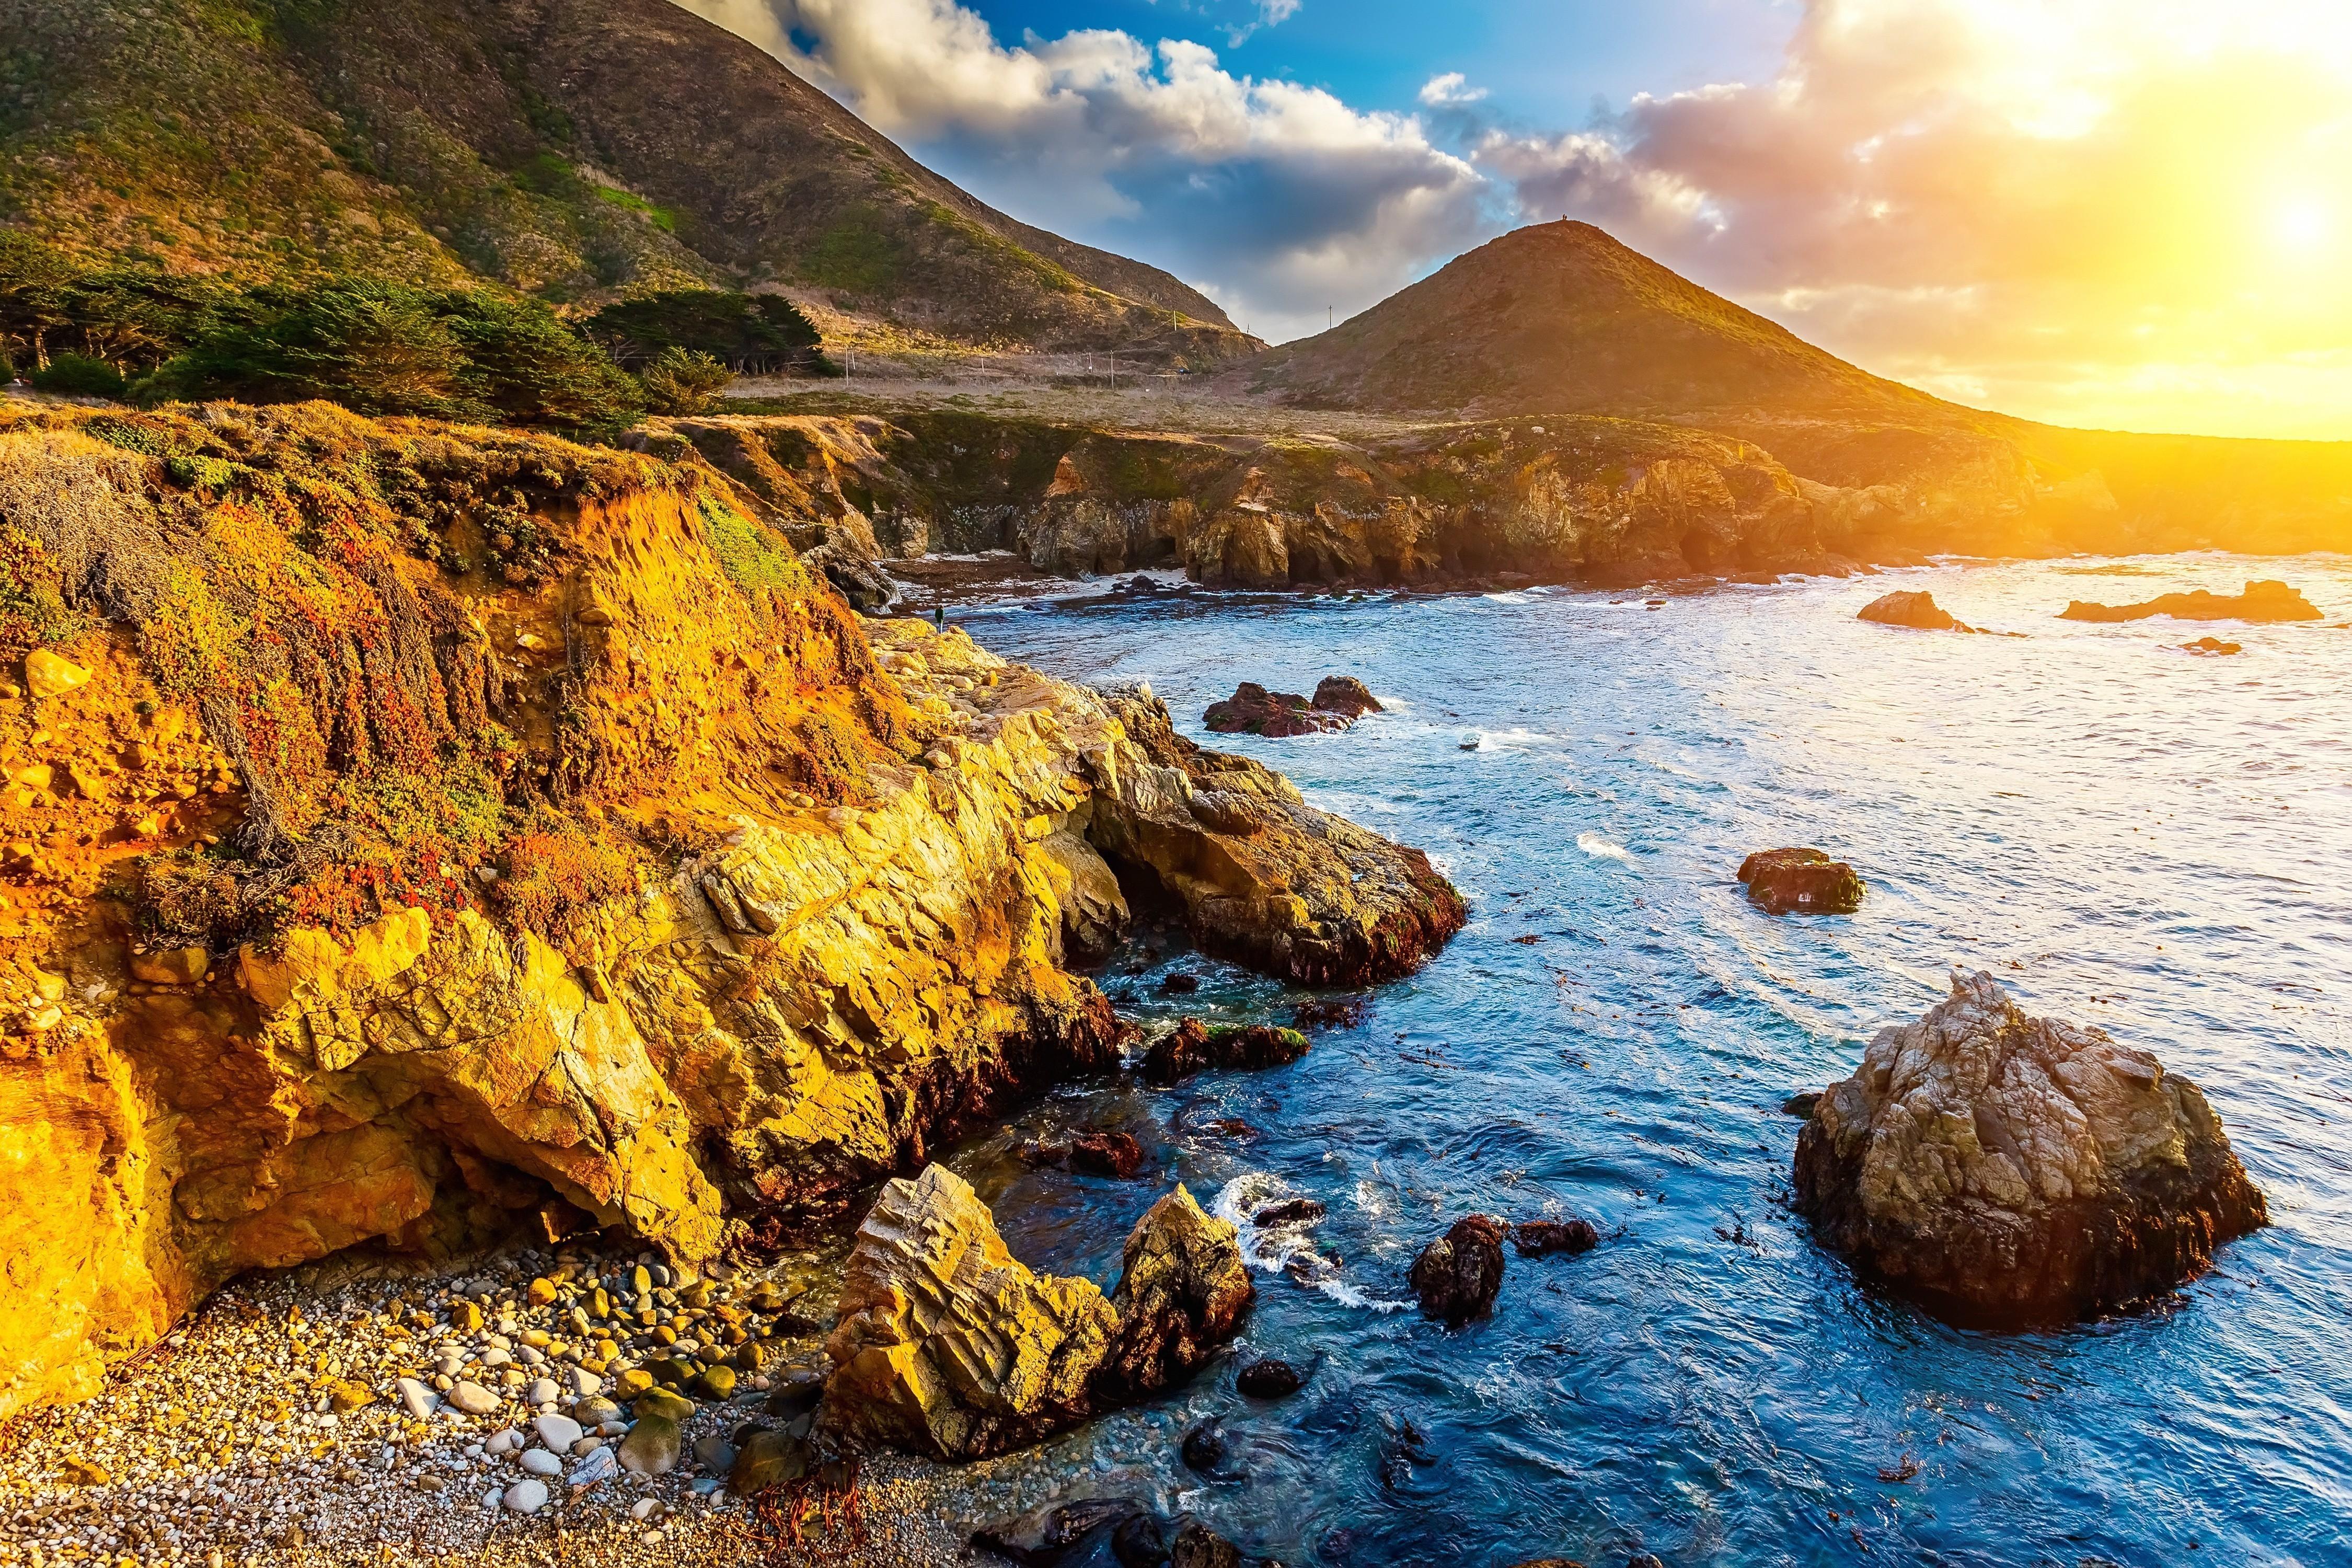 California Coast 4k Ultra HD Wallpaper Background Image 4500x3000